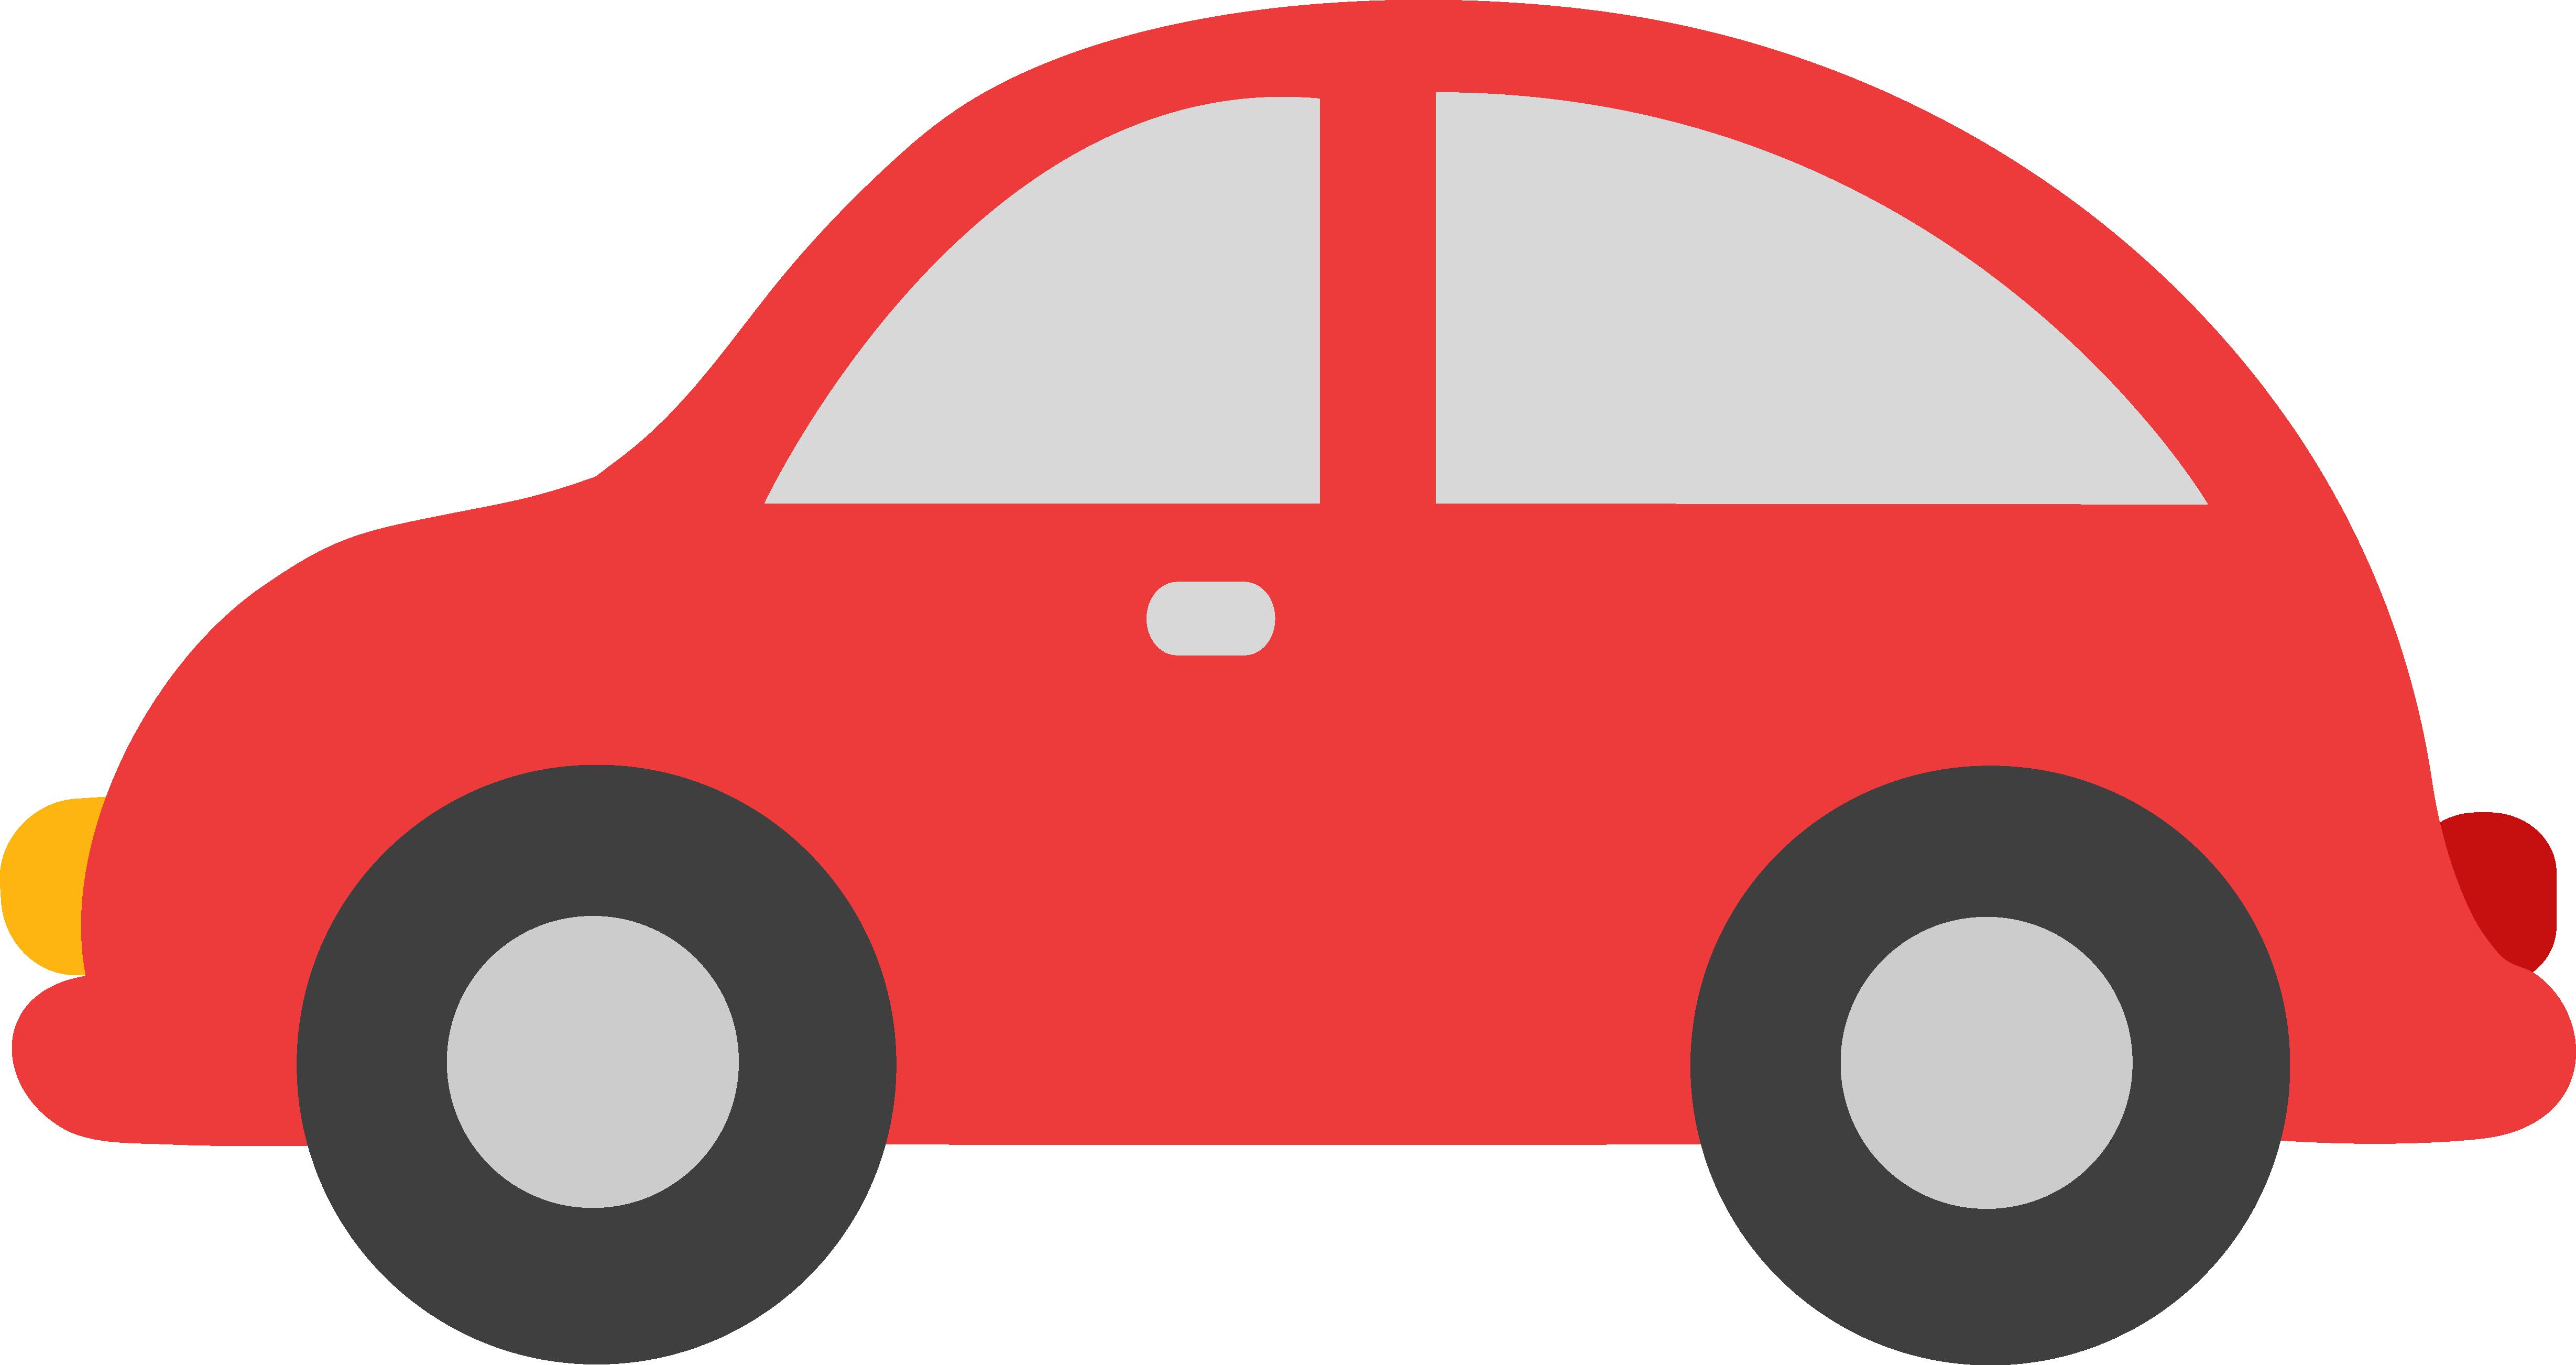 Toys car clipart  cute car illustration  Google Search  Max  Pinterest  Clip art